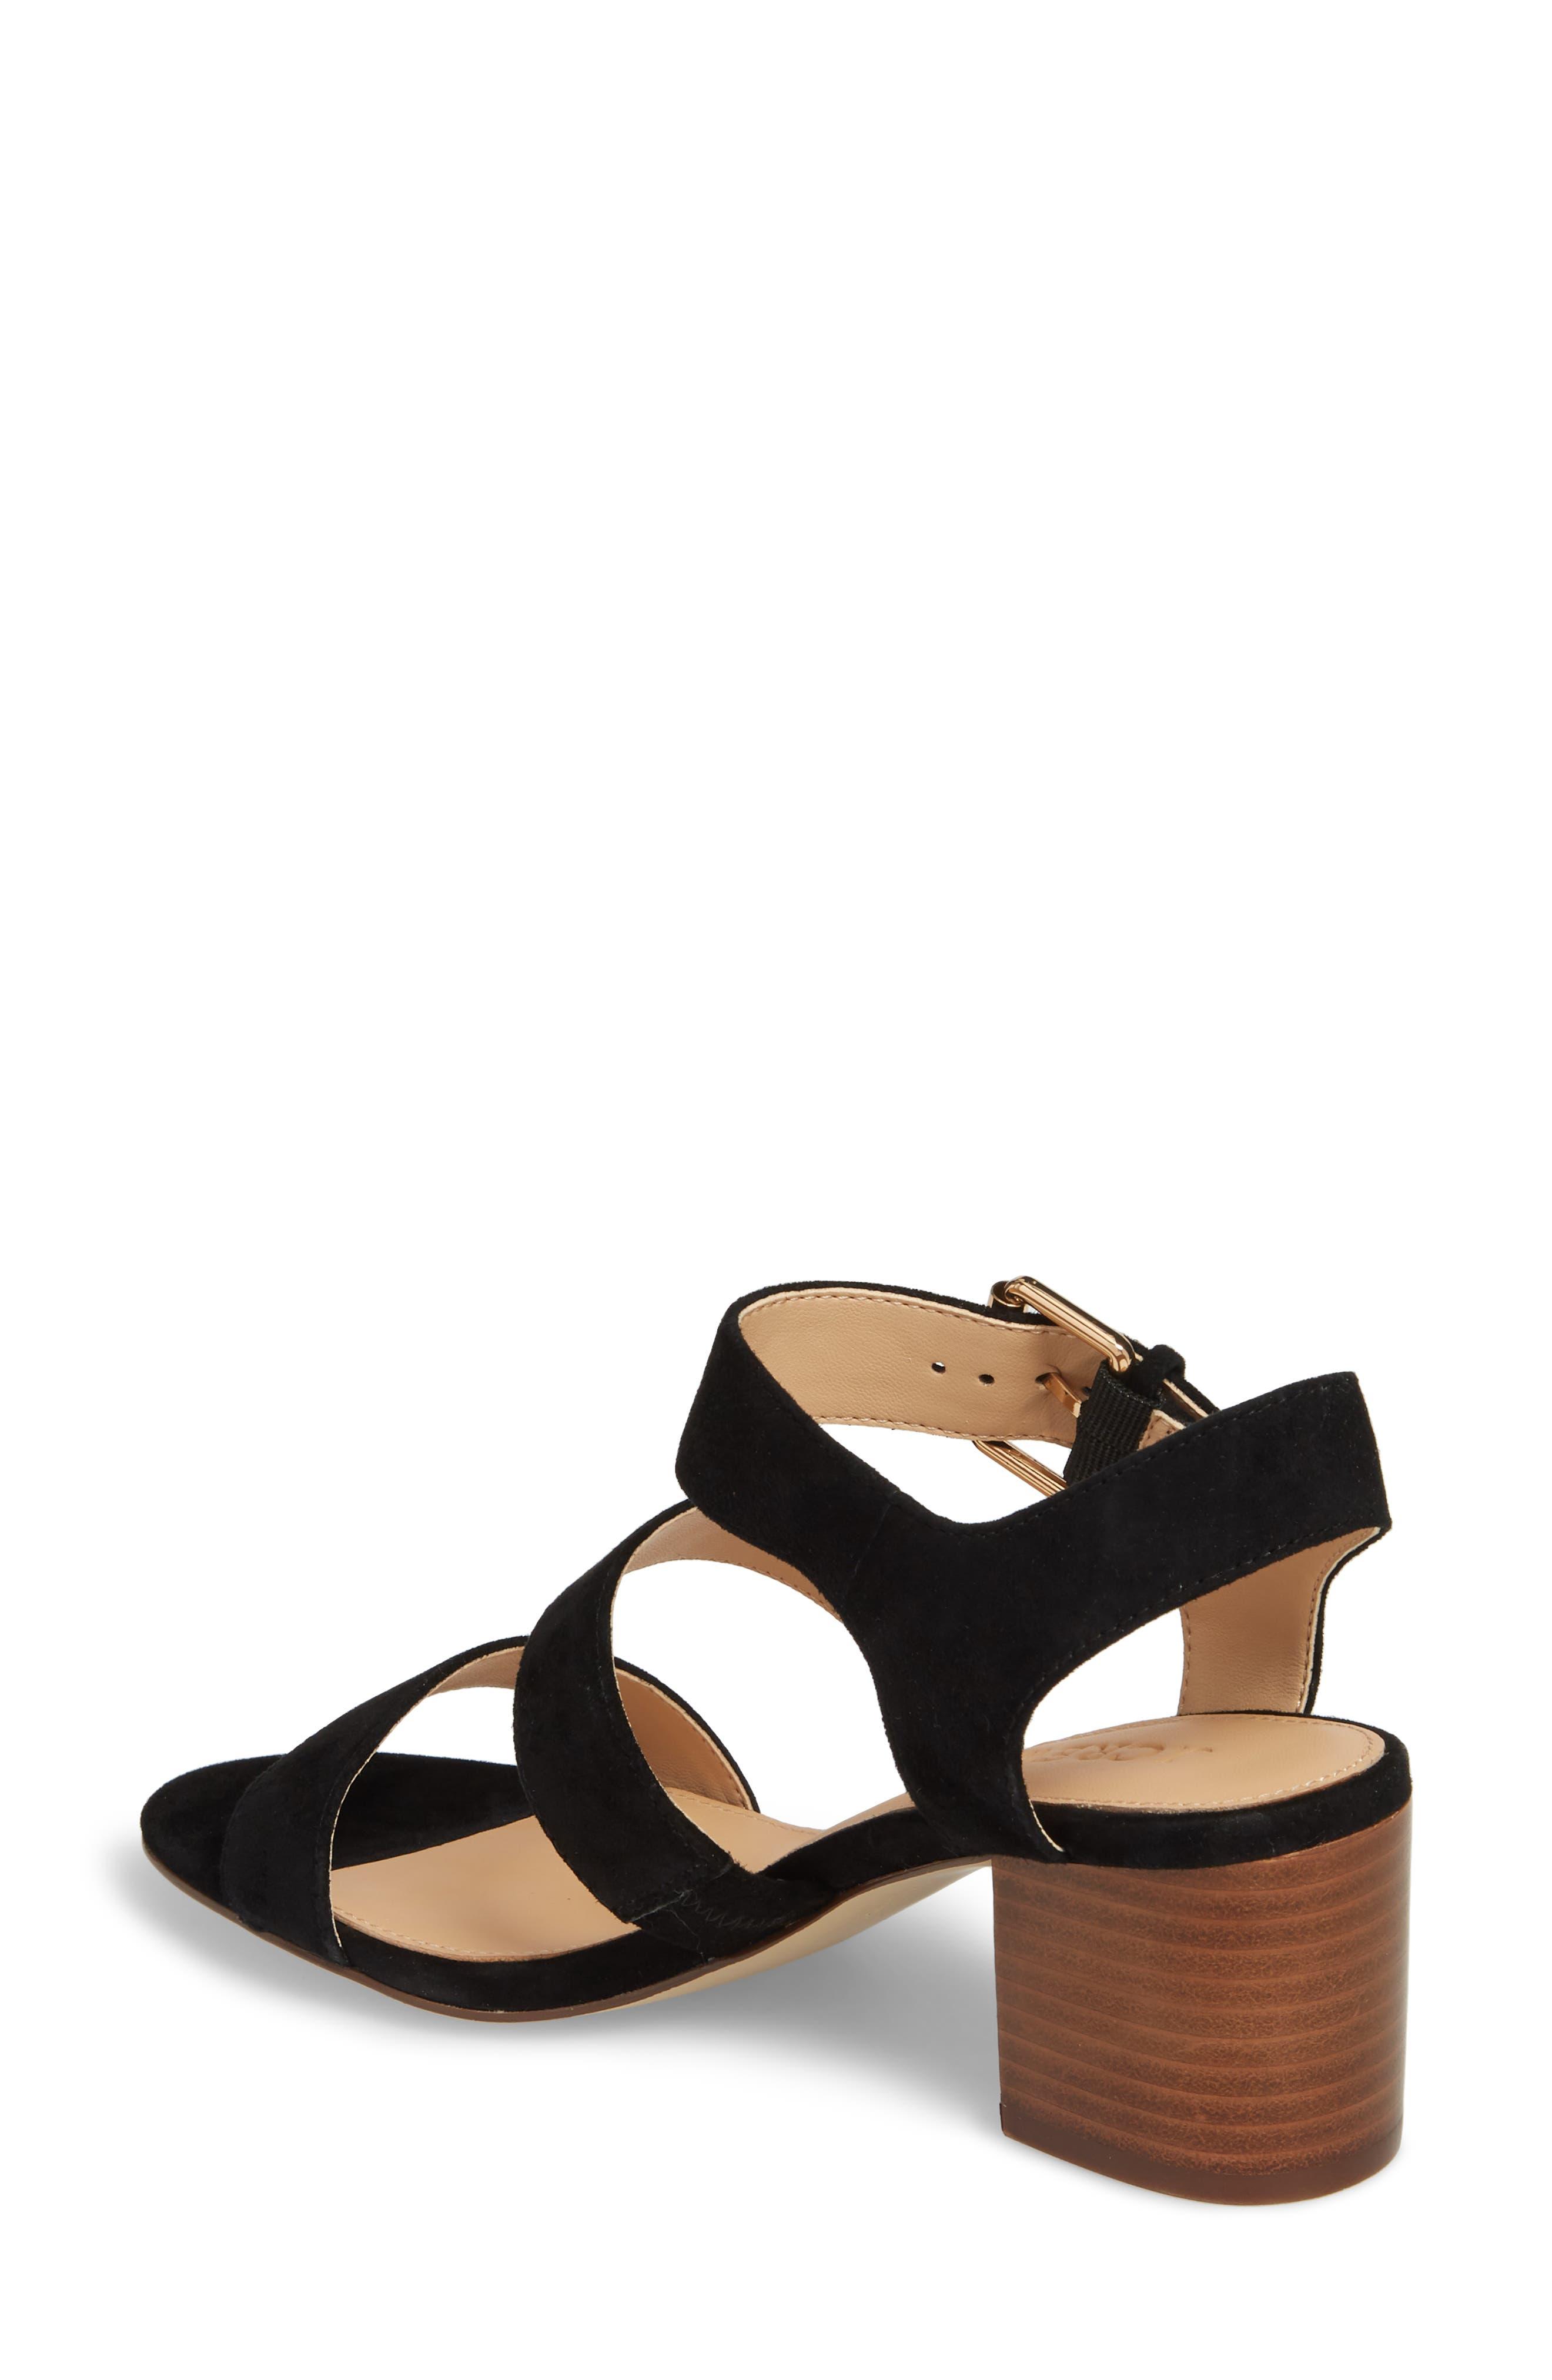 Three-Strap Suede Sandal,                             Alternate thumbnail 2, color,                             Black Suede